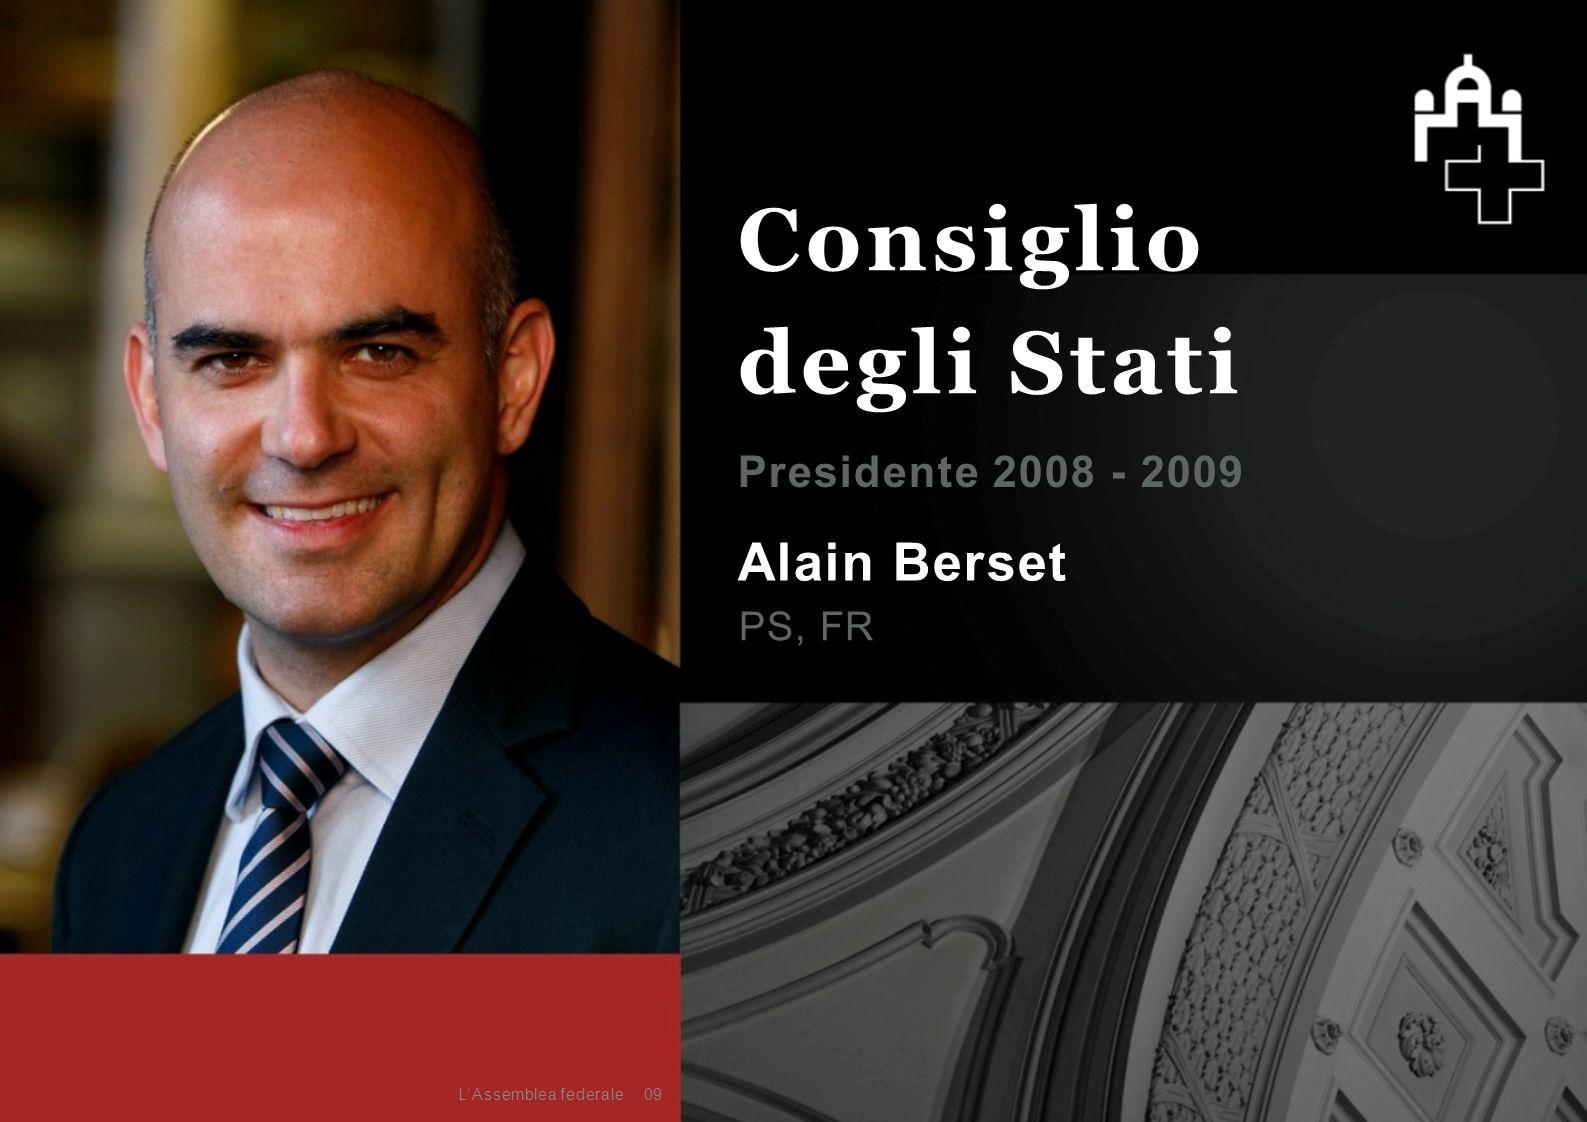 Alain Berset PS, FR Presidente 2008 - 2009 09 Consiglio degli Stati L'Assemblea federale